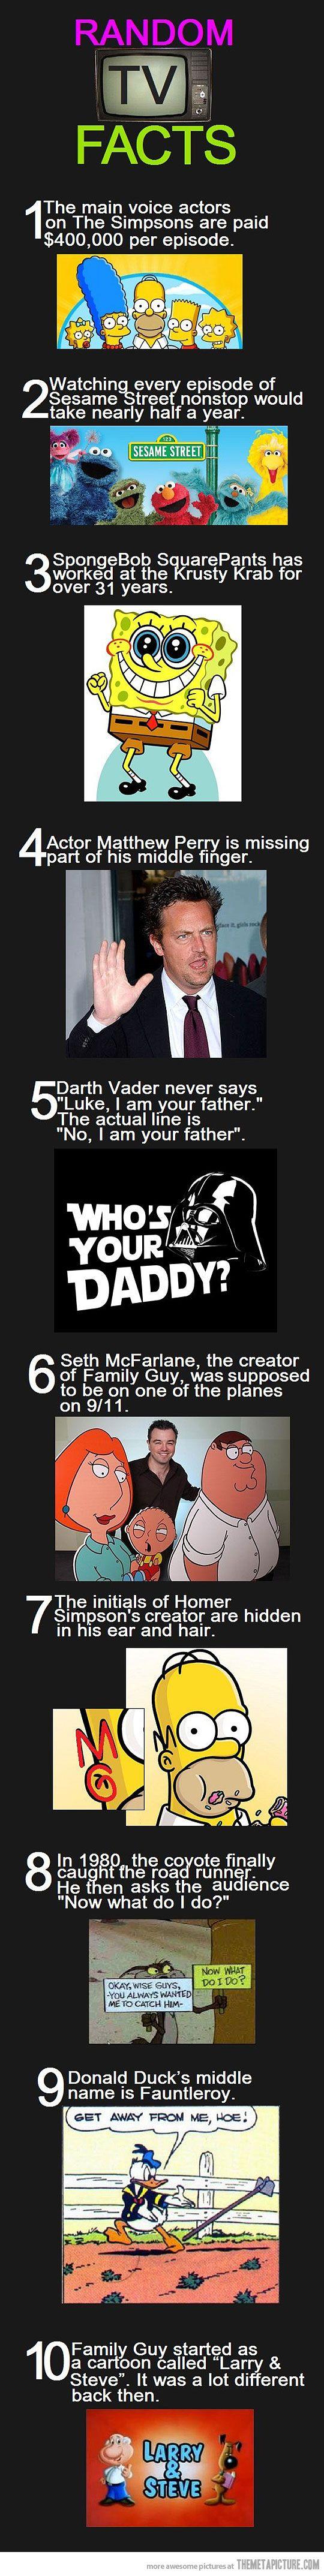 interesting tv facts